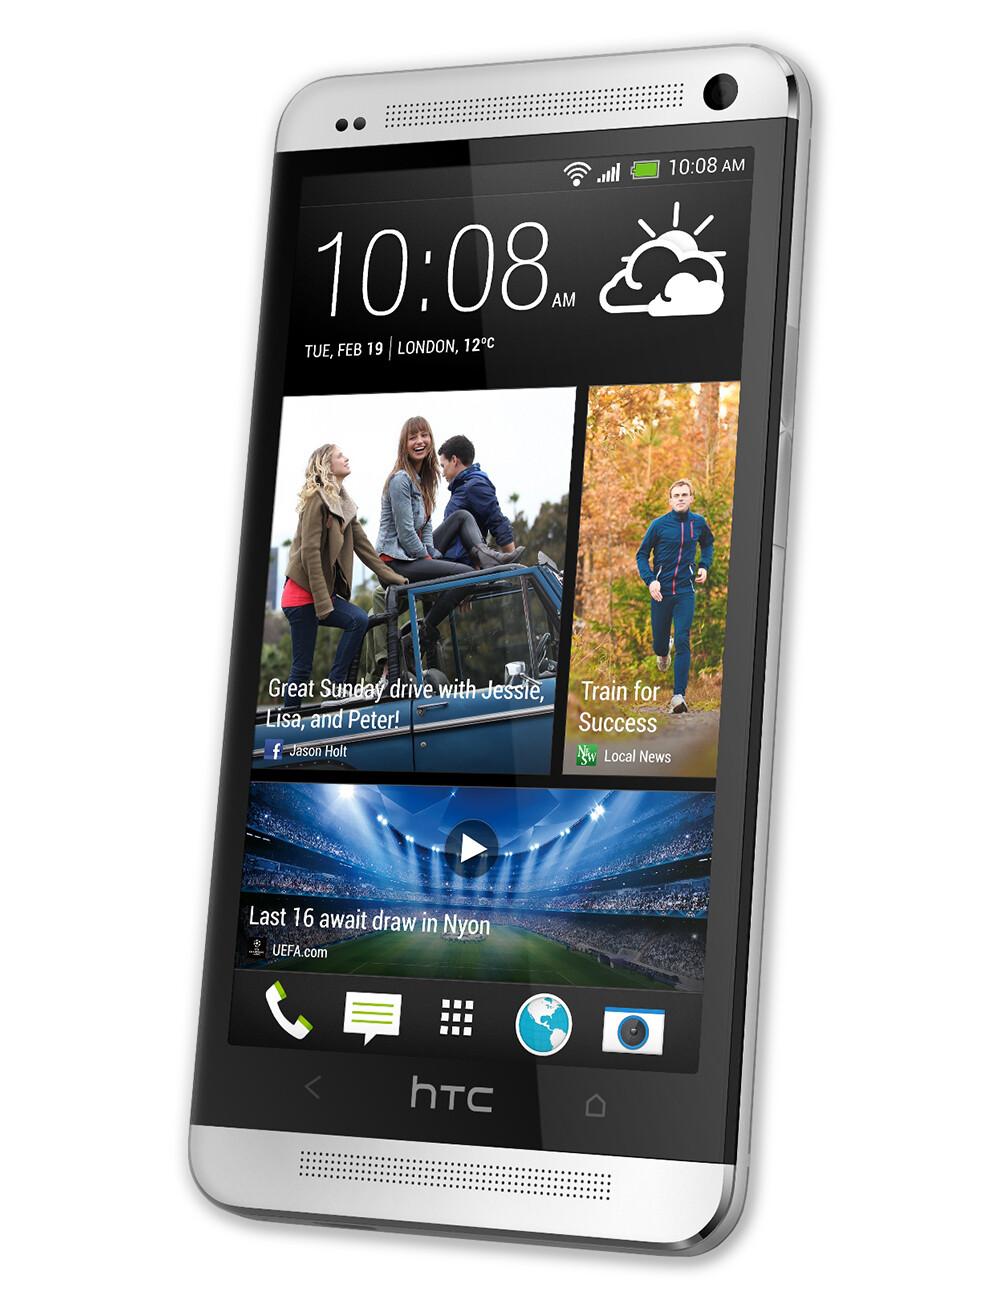 HTC One full specs